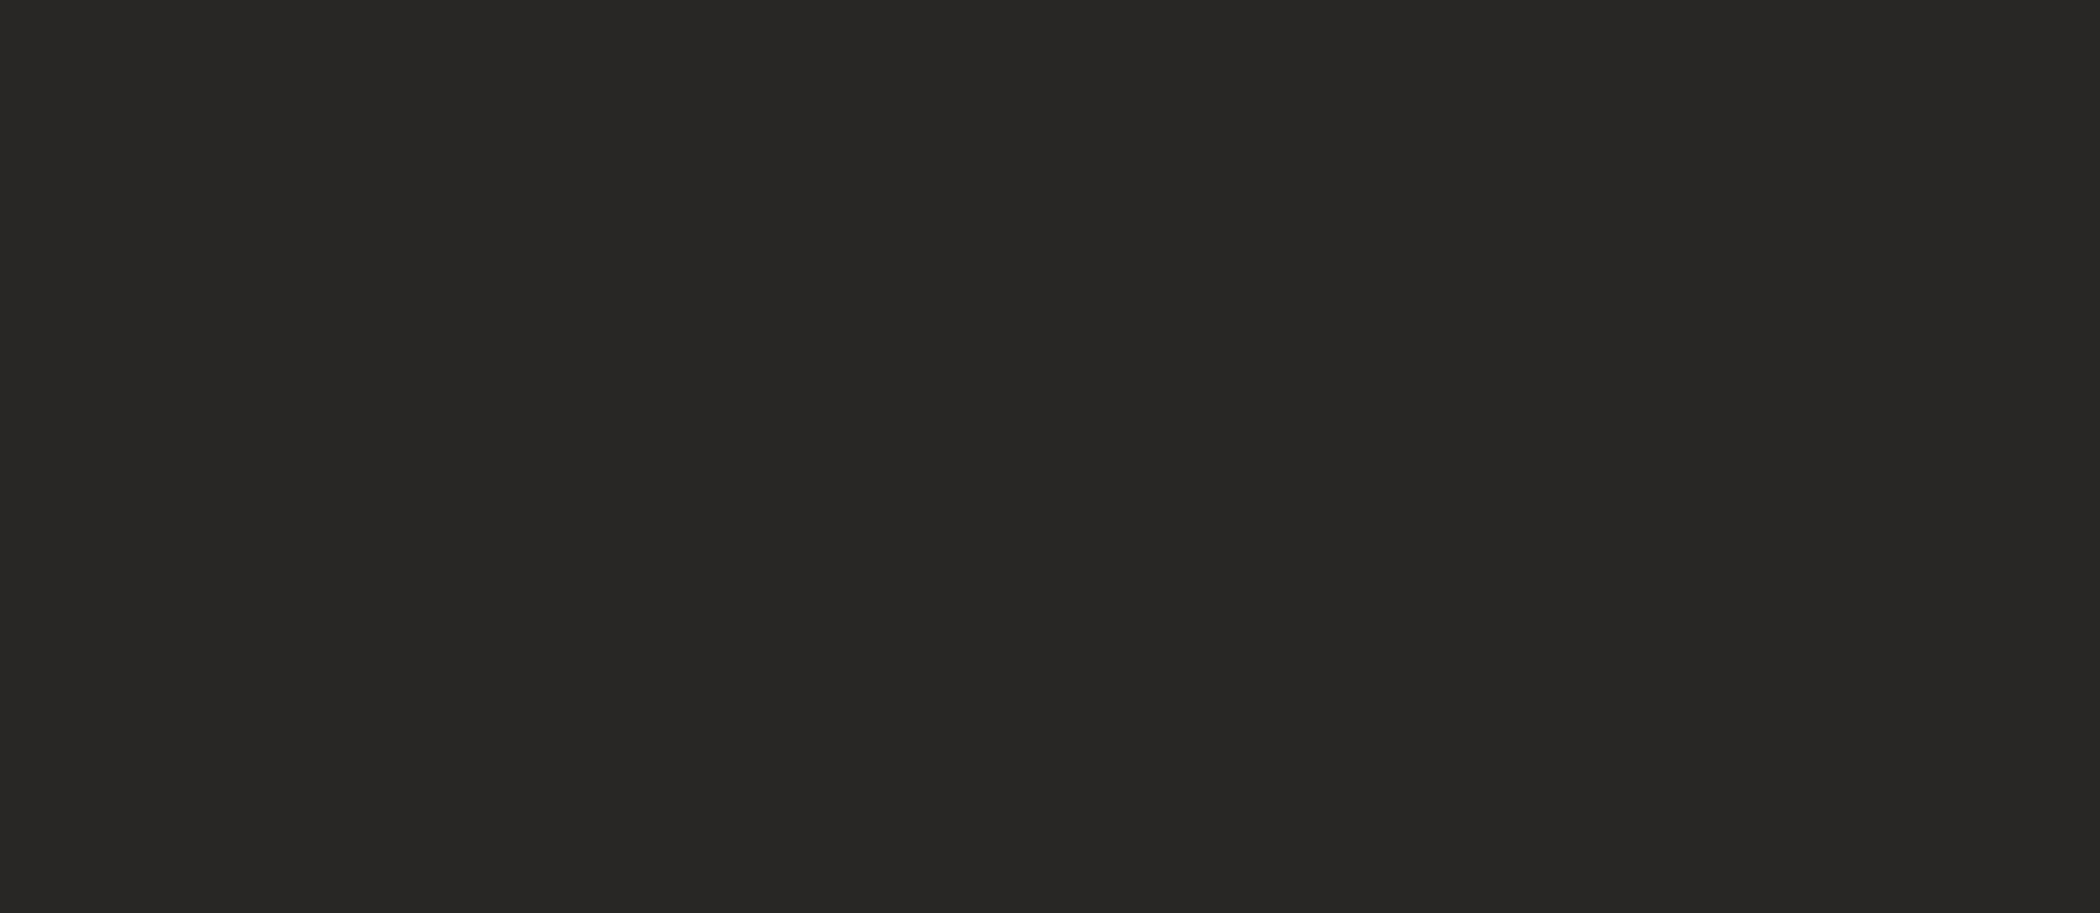 Paterne texture boi